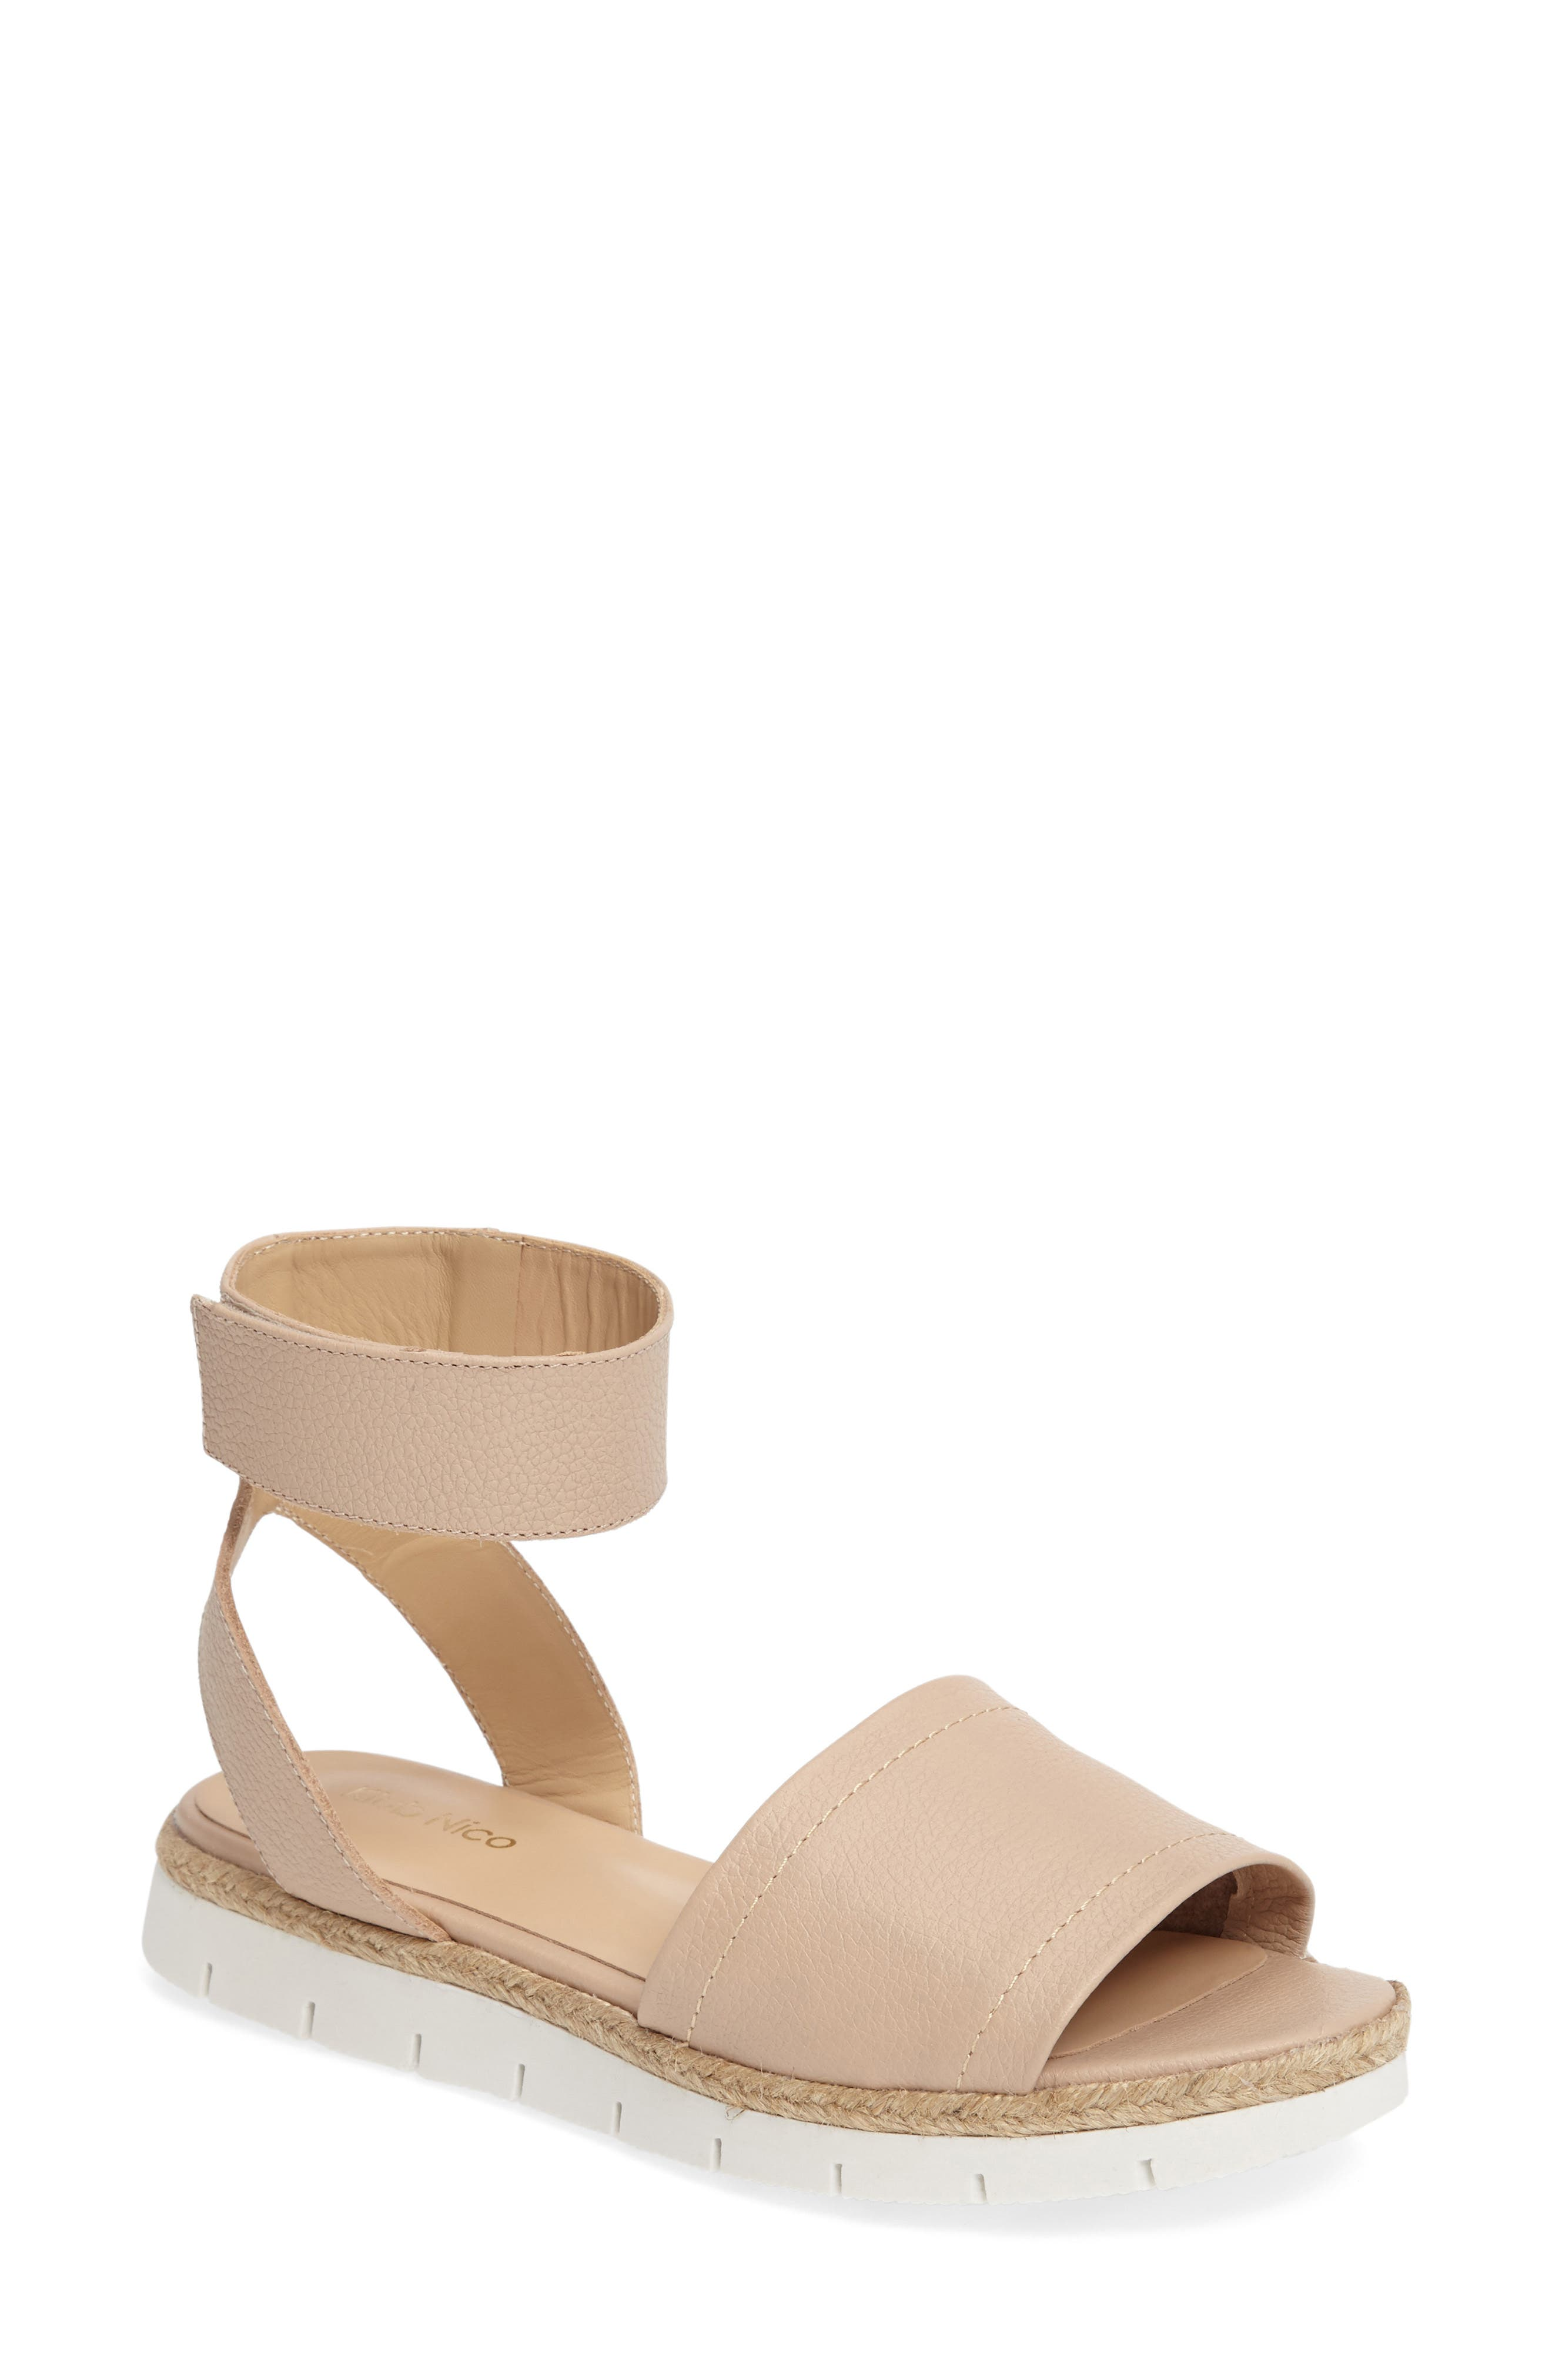 Cleo Platform Sandal,                             Main thumbnail 4, color,